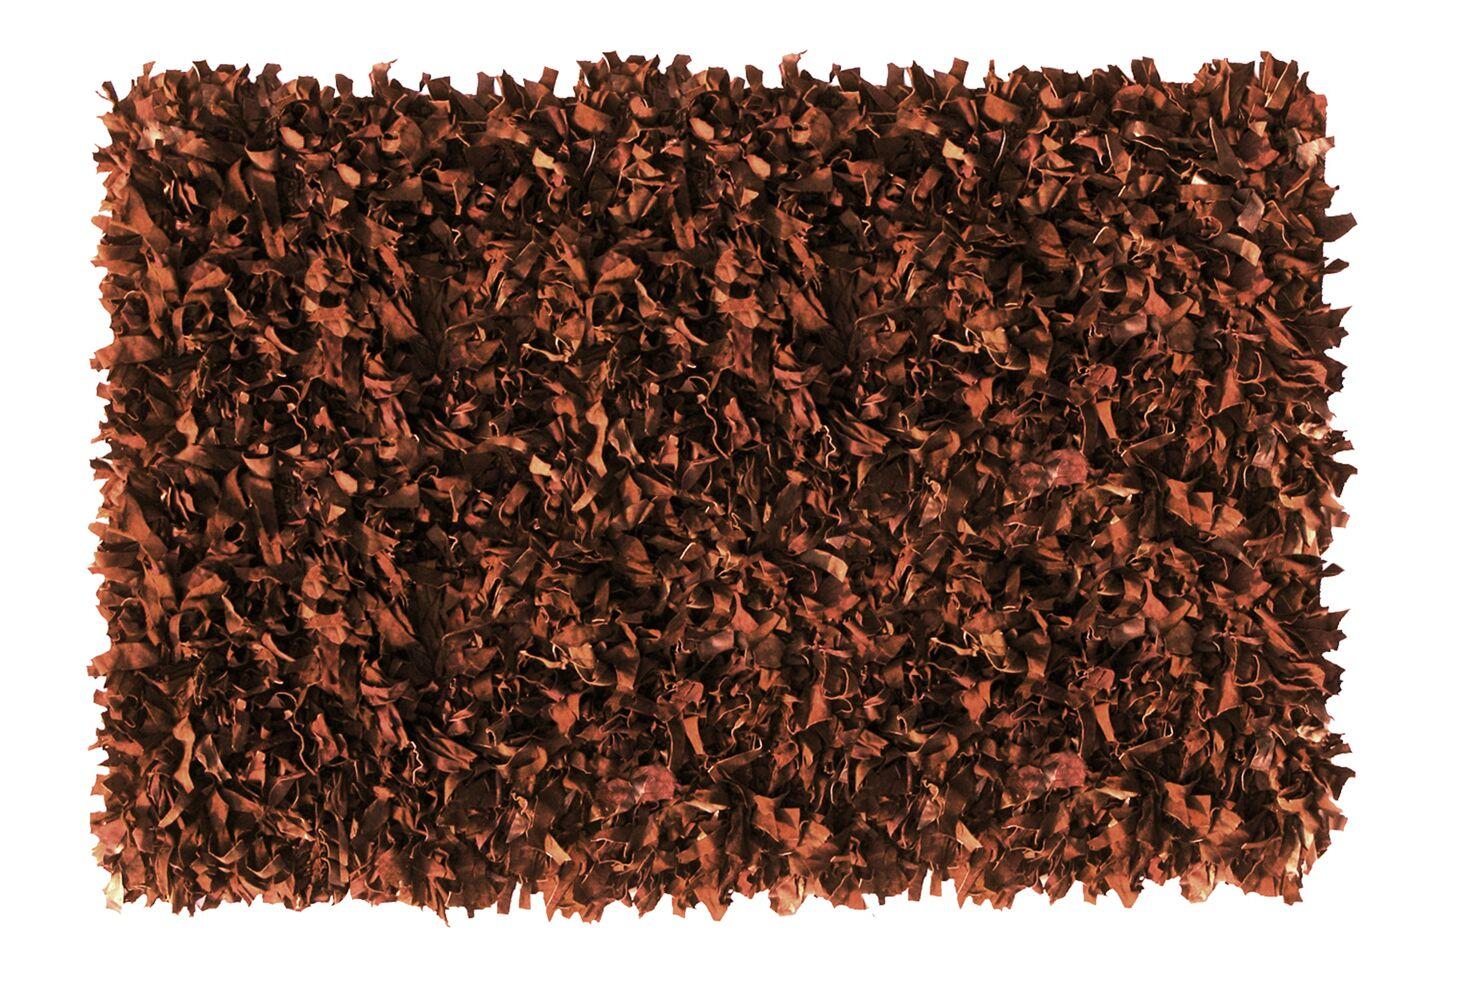 Handmade Brown Area Rug Rug Size: Rectangle 8' x 10'